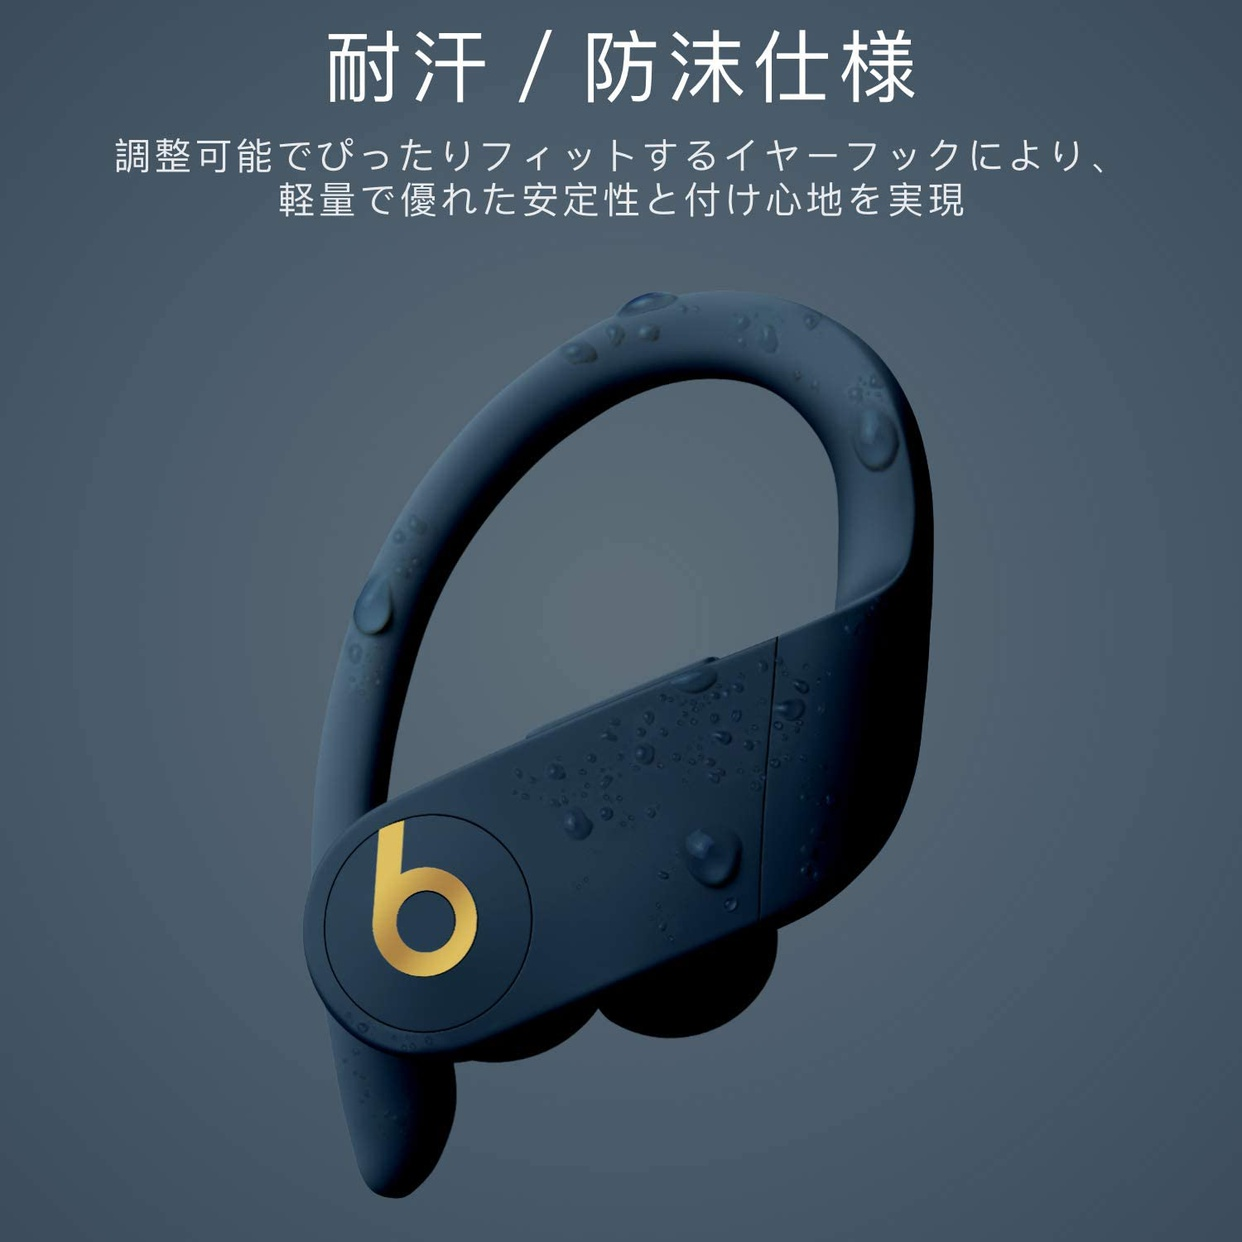 Apple(アップル) Powerbeats Pro-Totallyの商品画像3